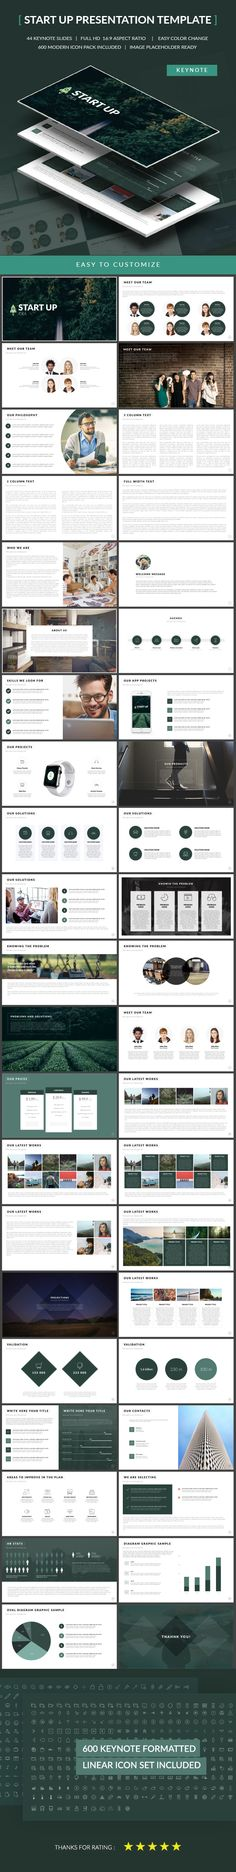 Start Up Presentation Template on Behance